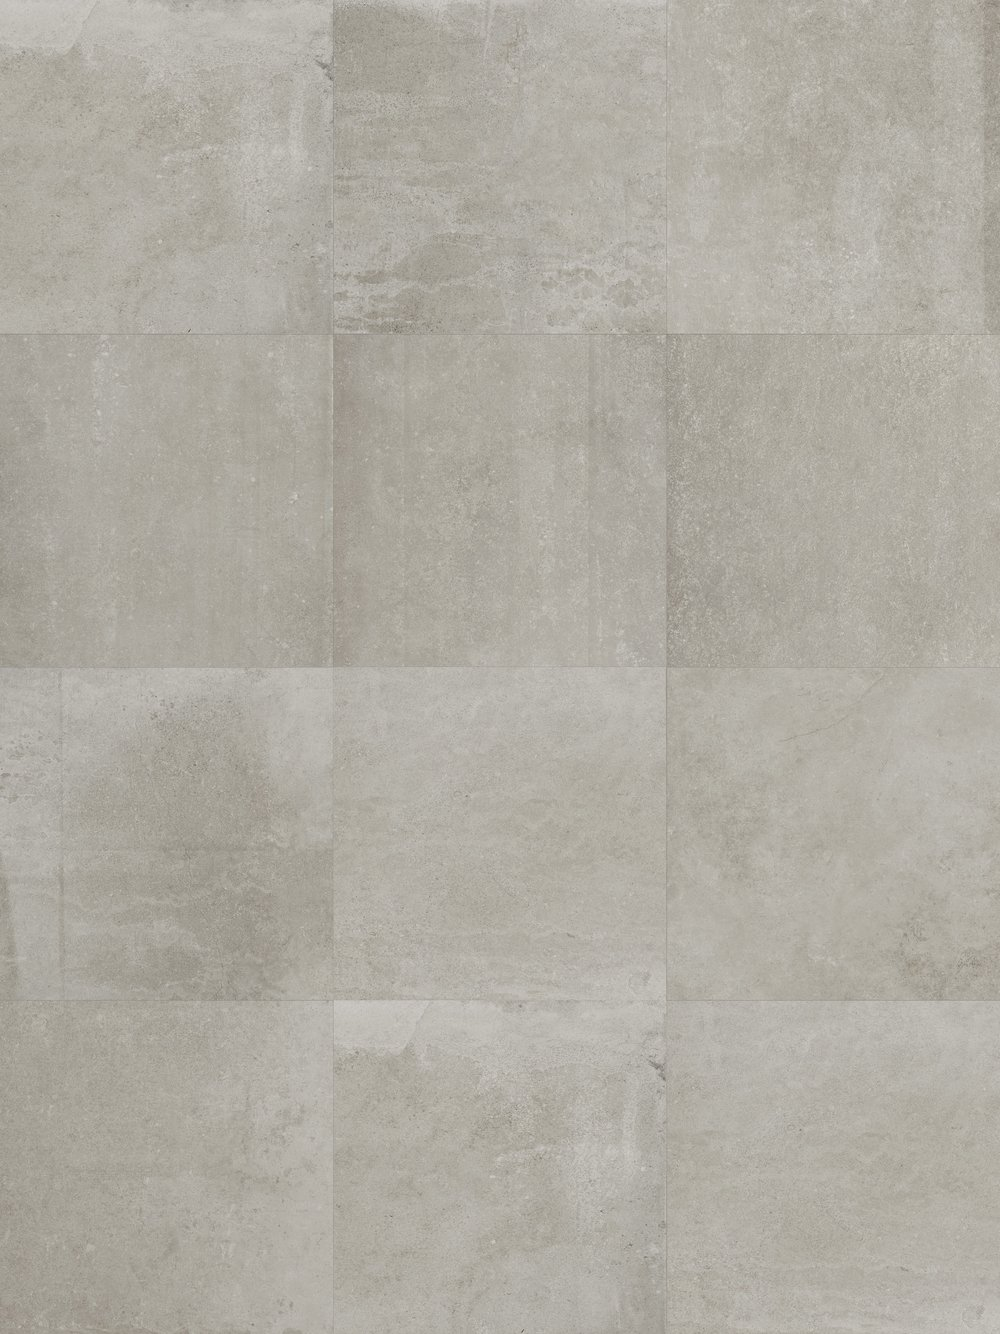 Stonedesign_Cinnamon 60x60 matt.jpg